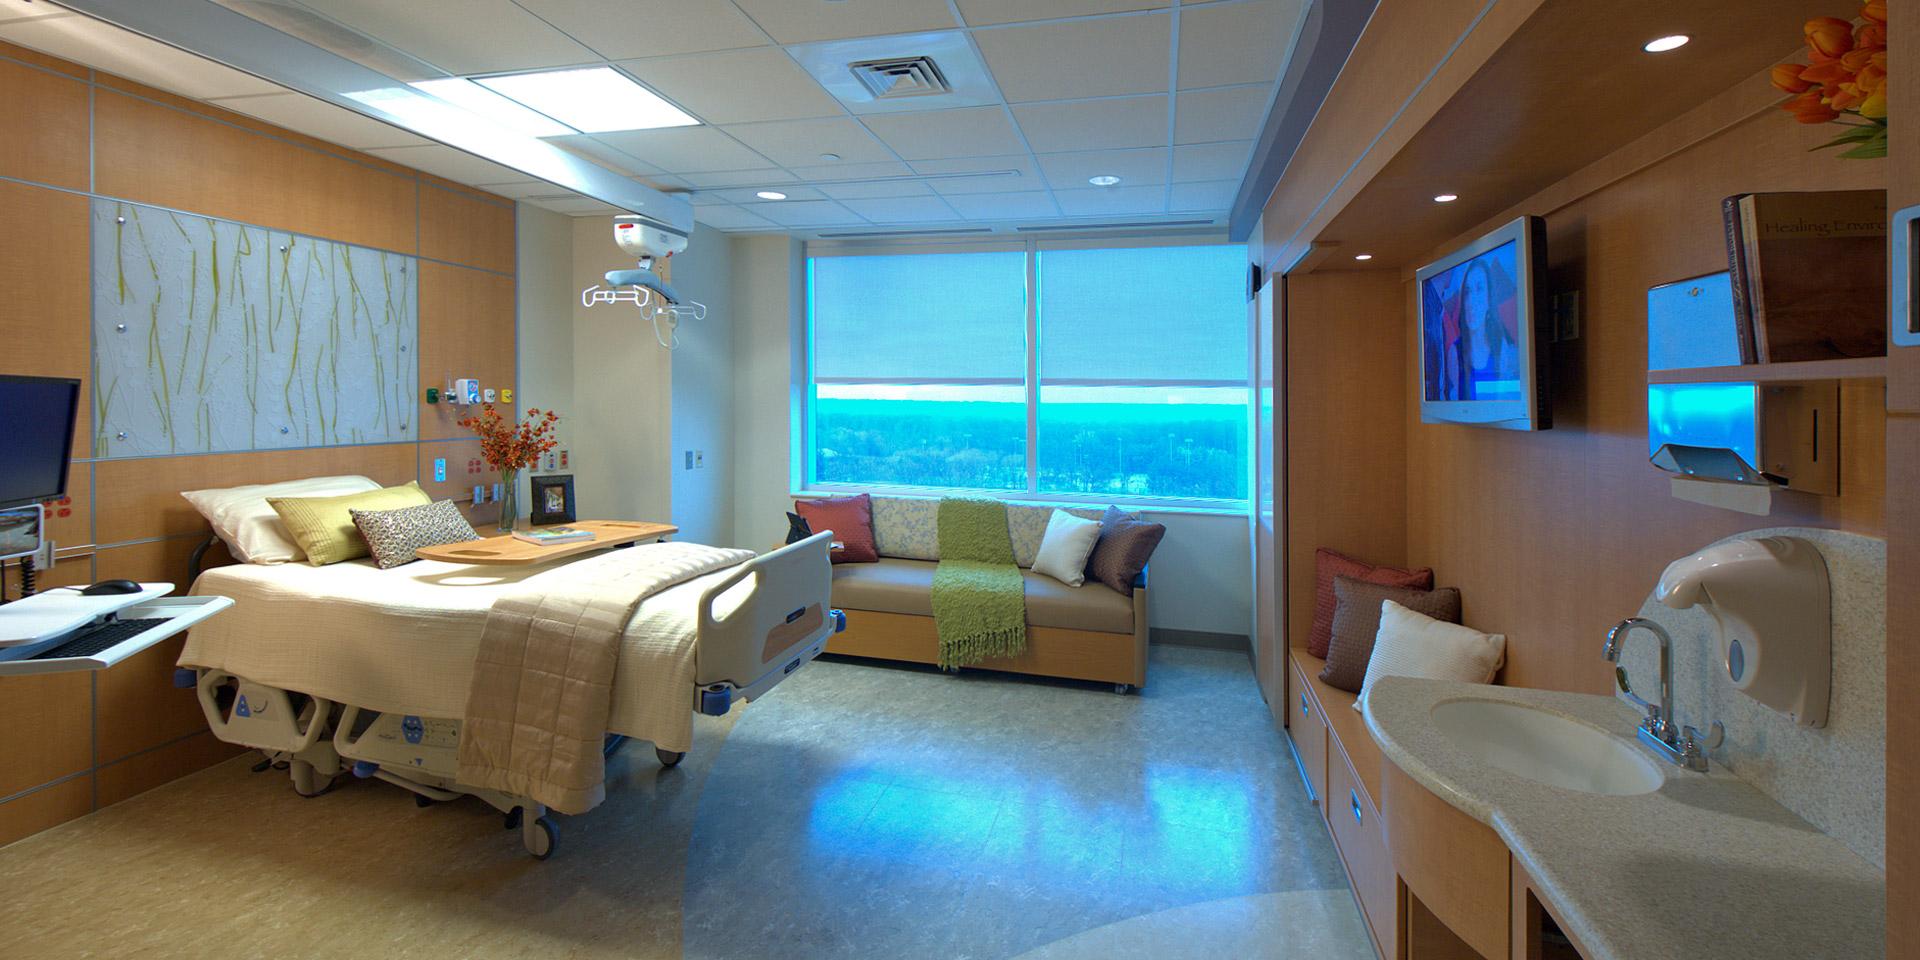 Inova Fairfax Hospital Bed Modernization